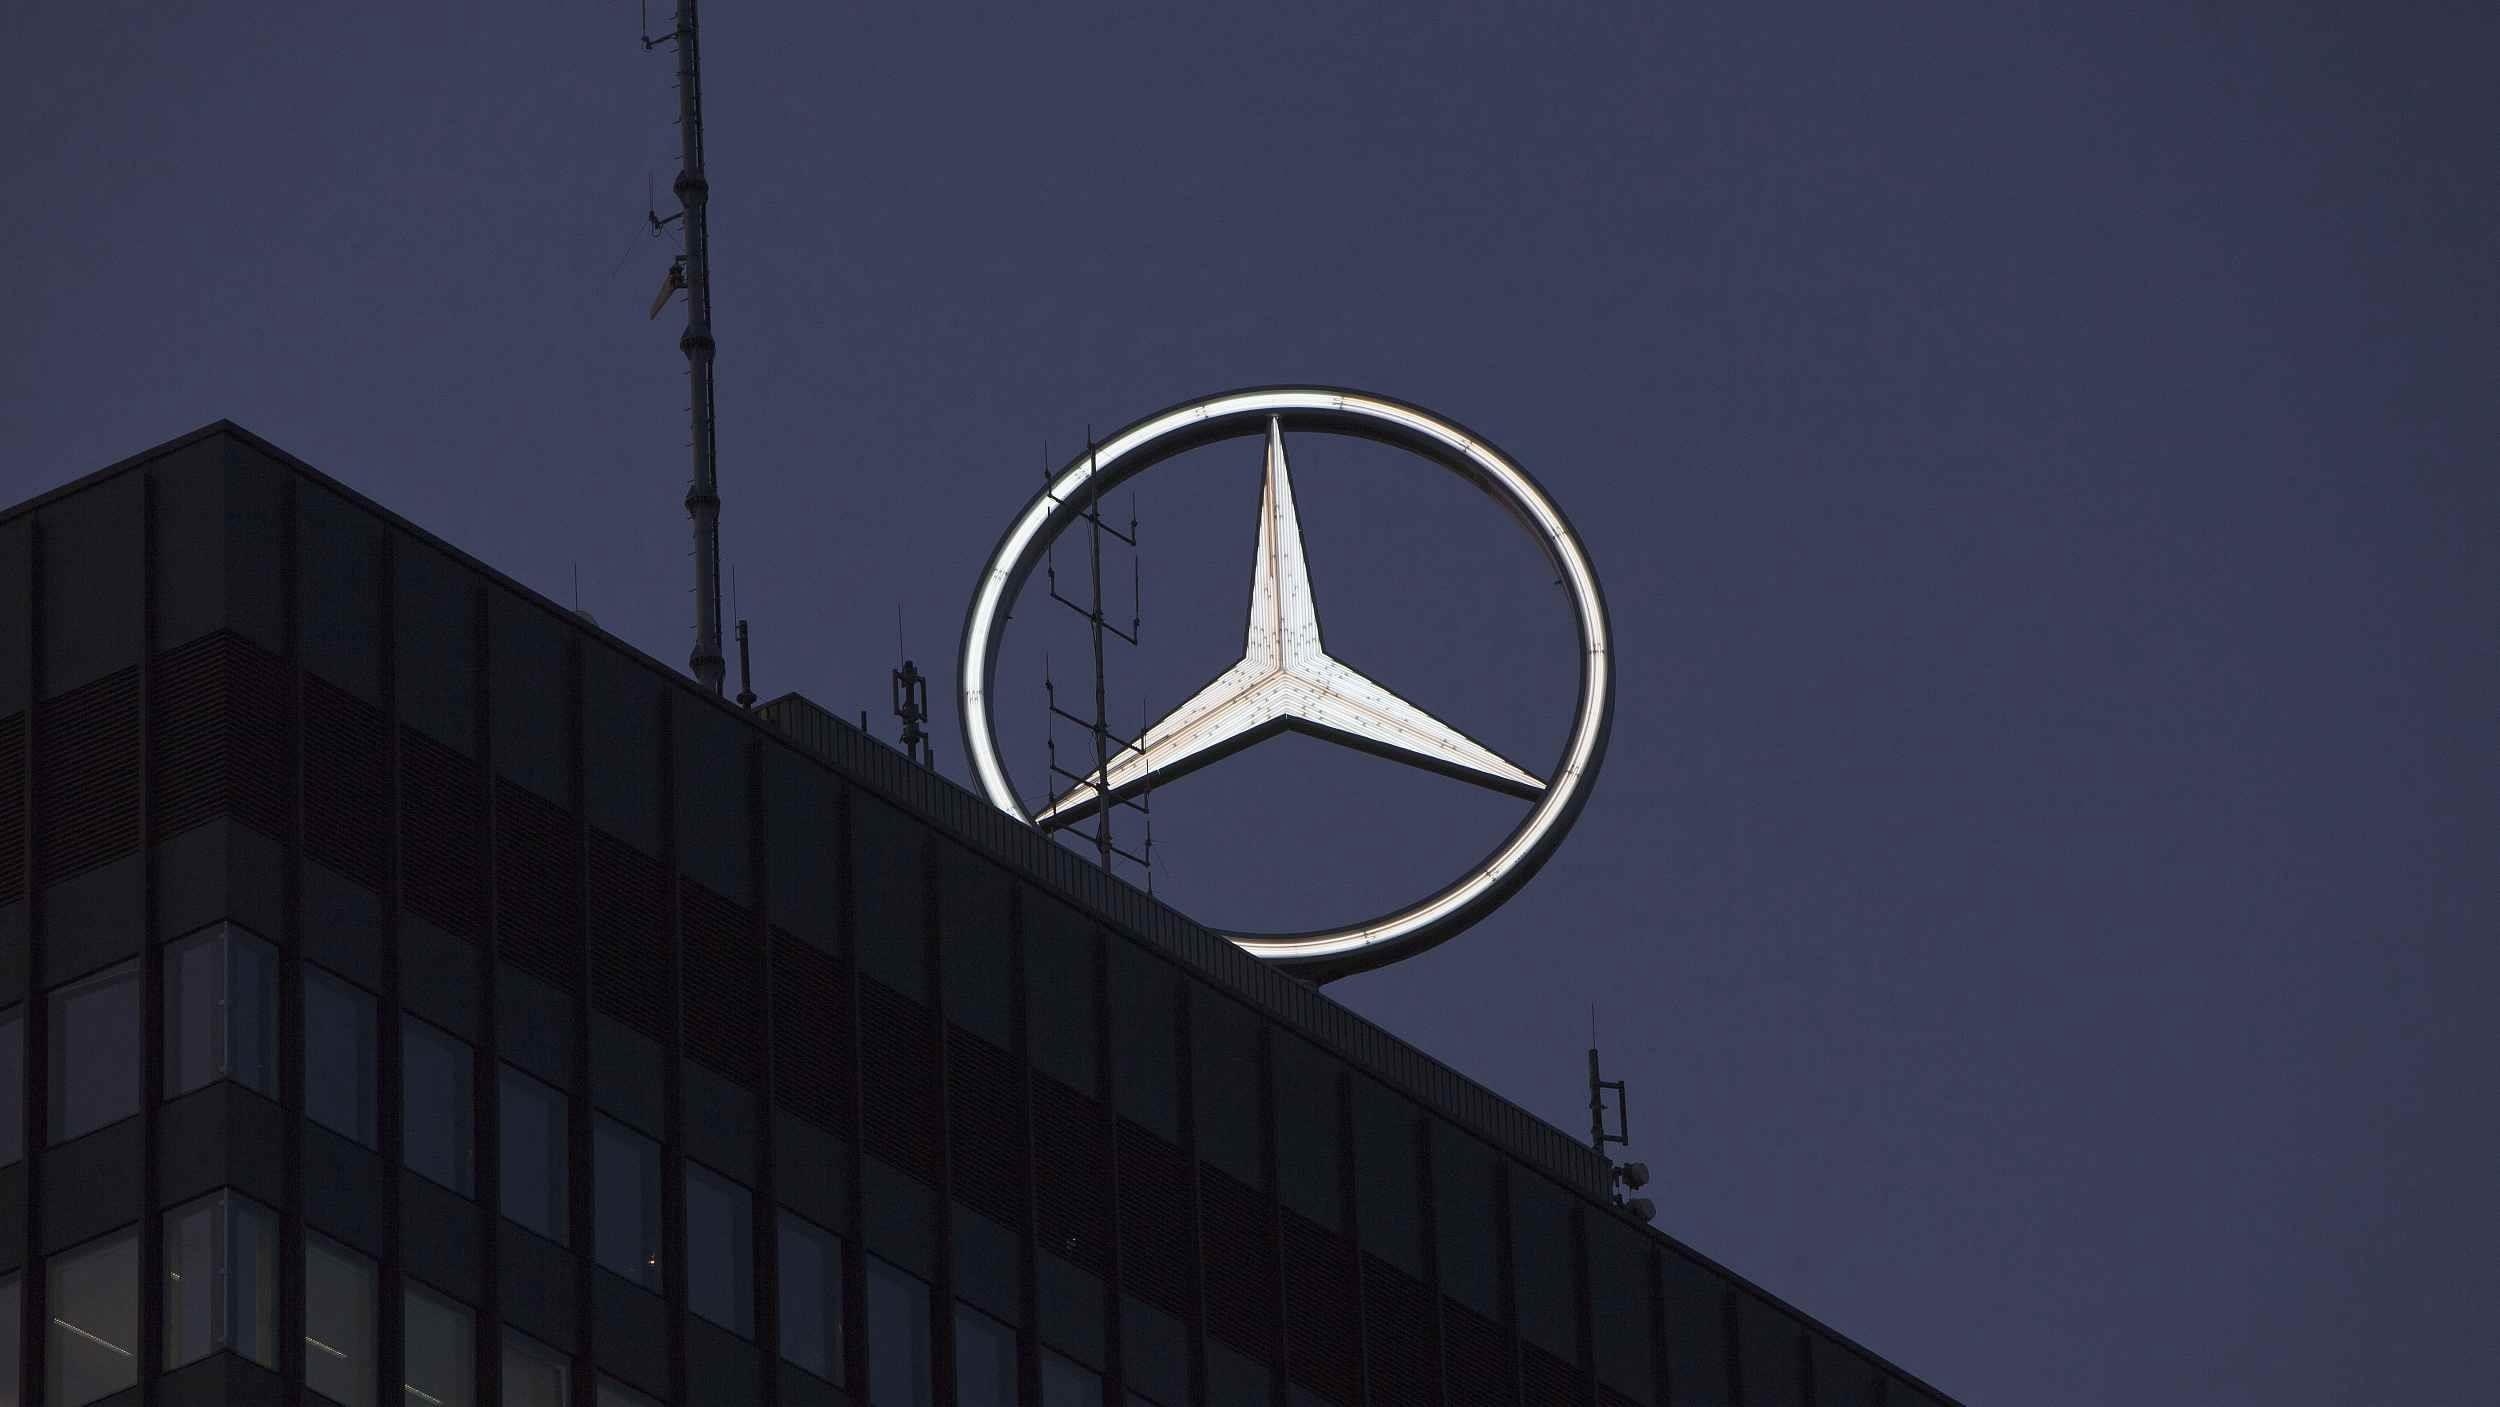 Mercedes-Benz recalls over 39,000 vehicles in China